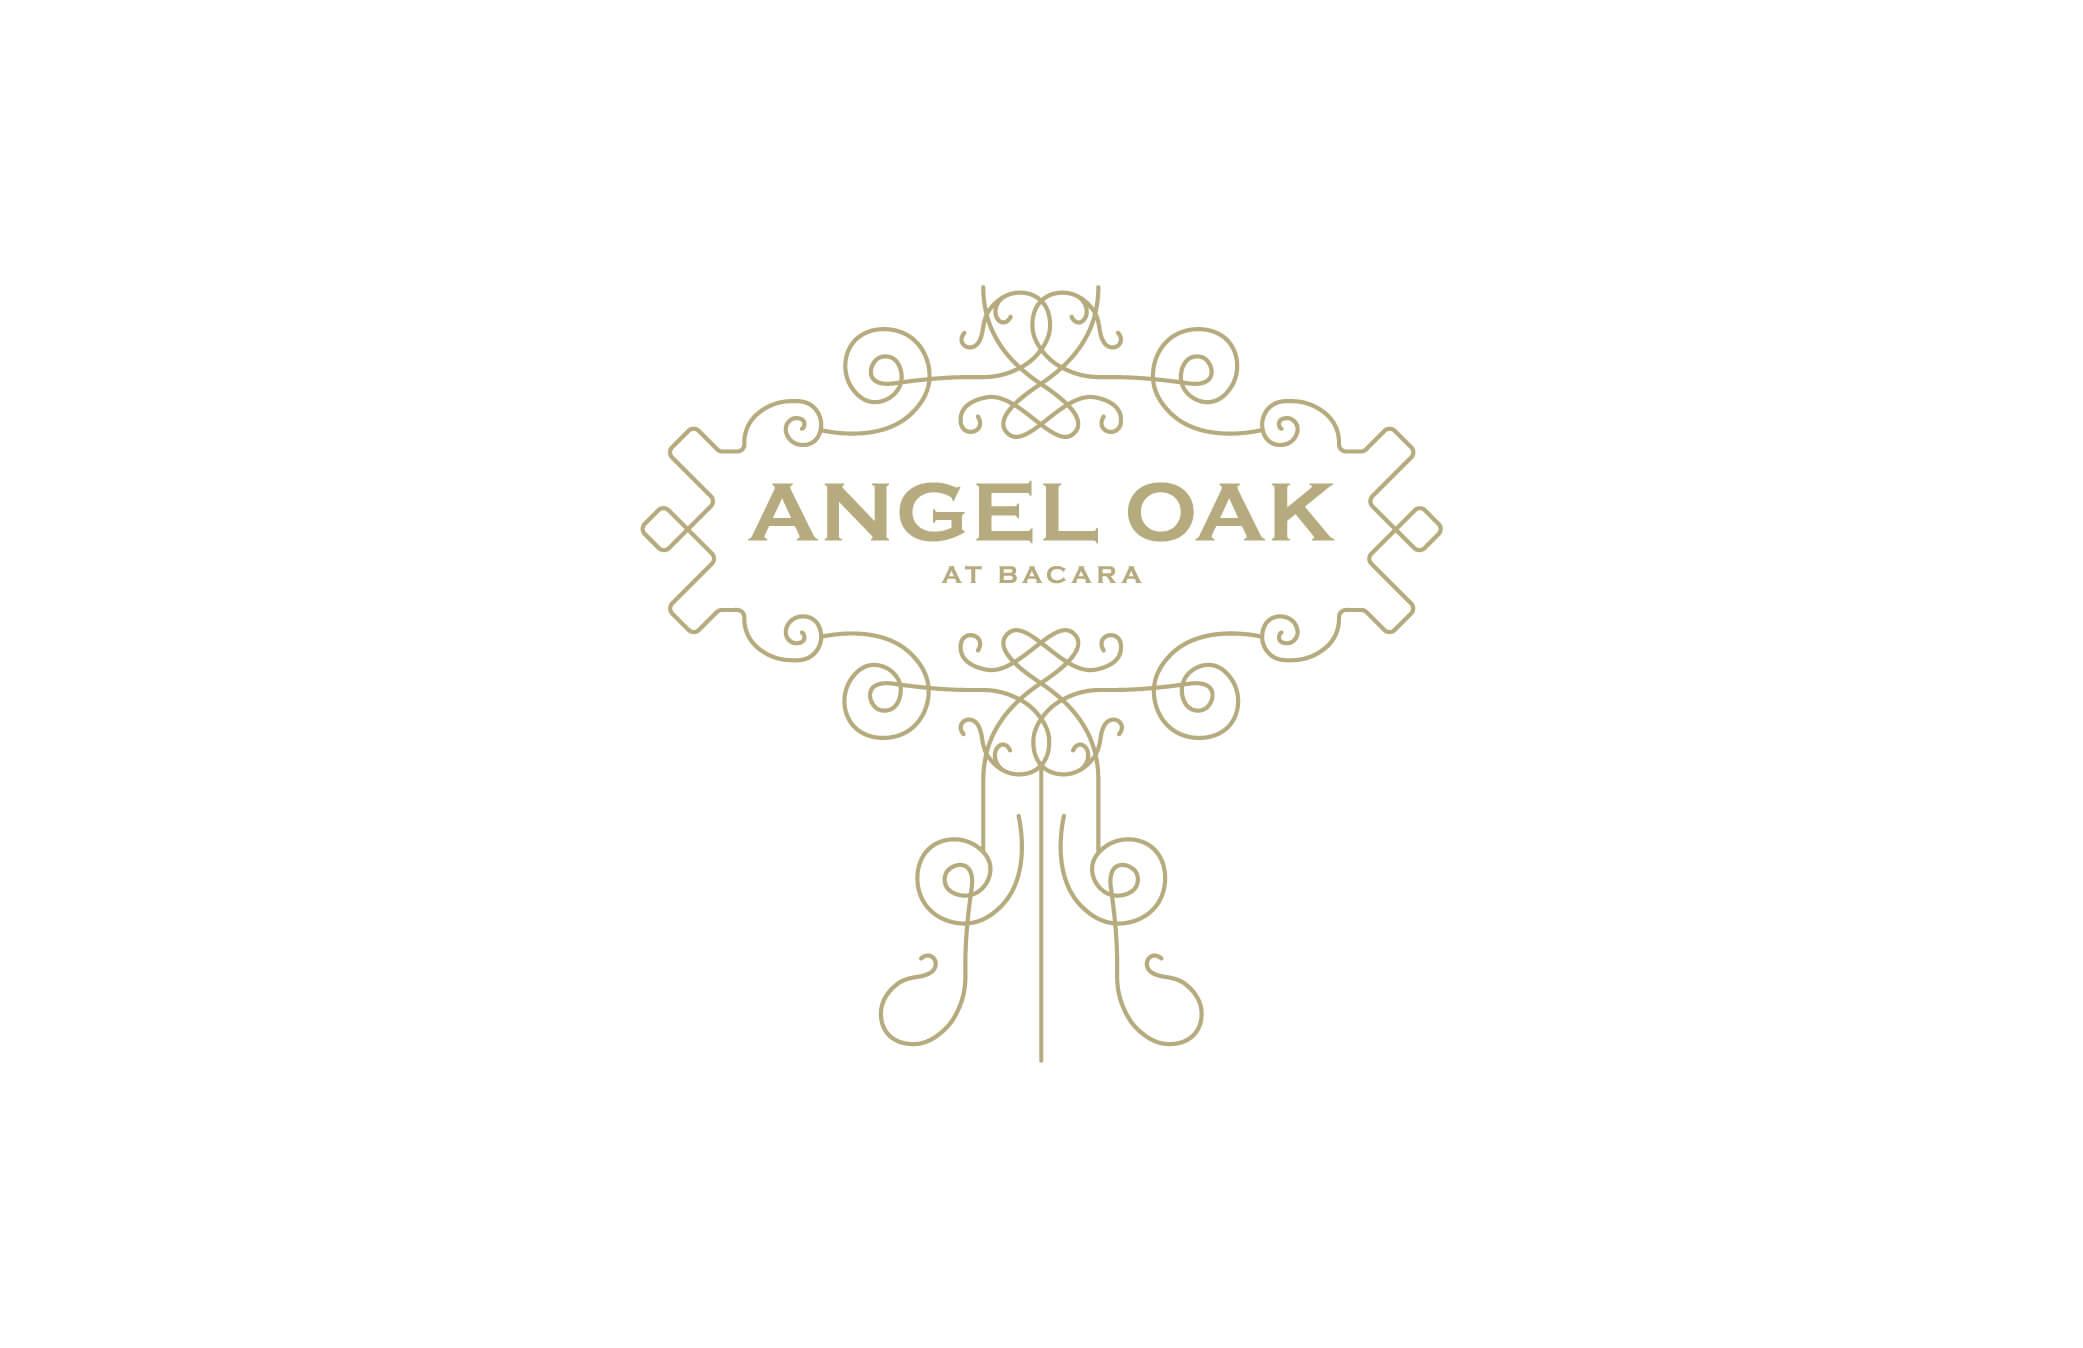 angel-oak-at-bacara-logo-design